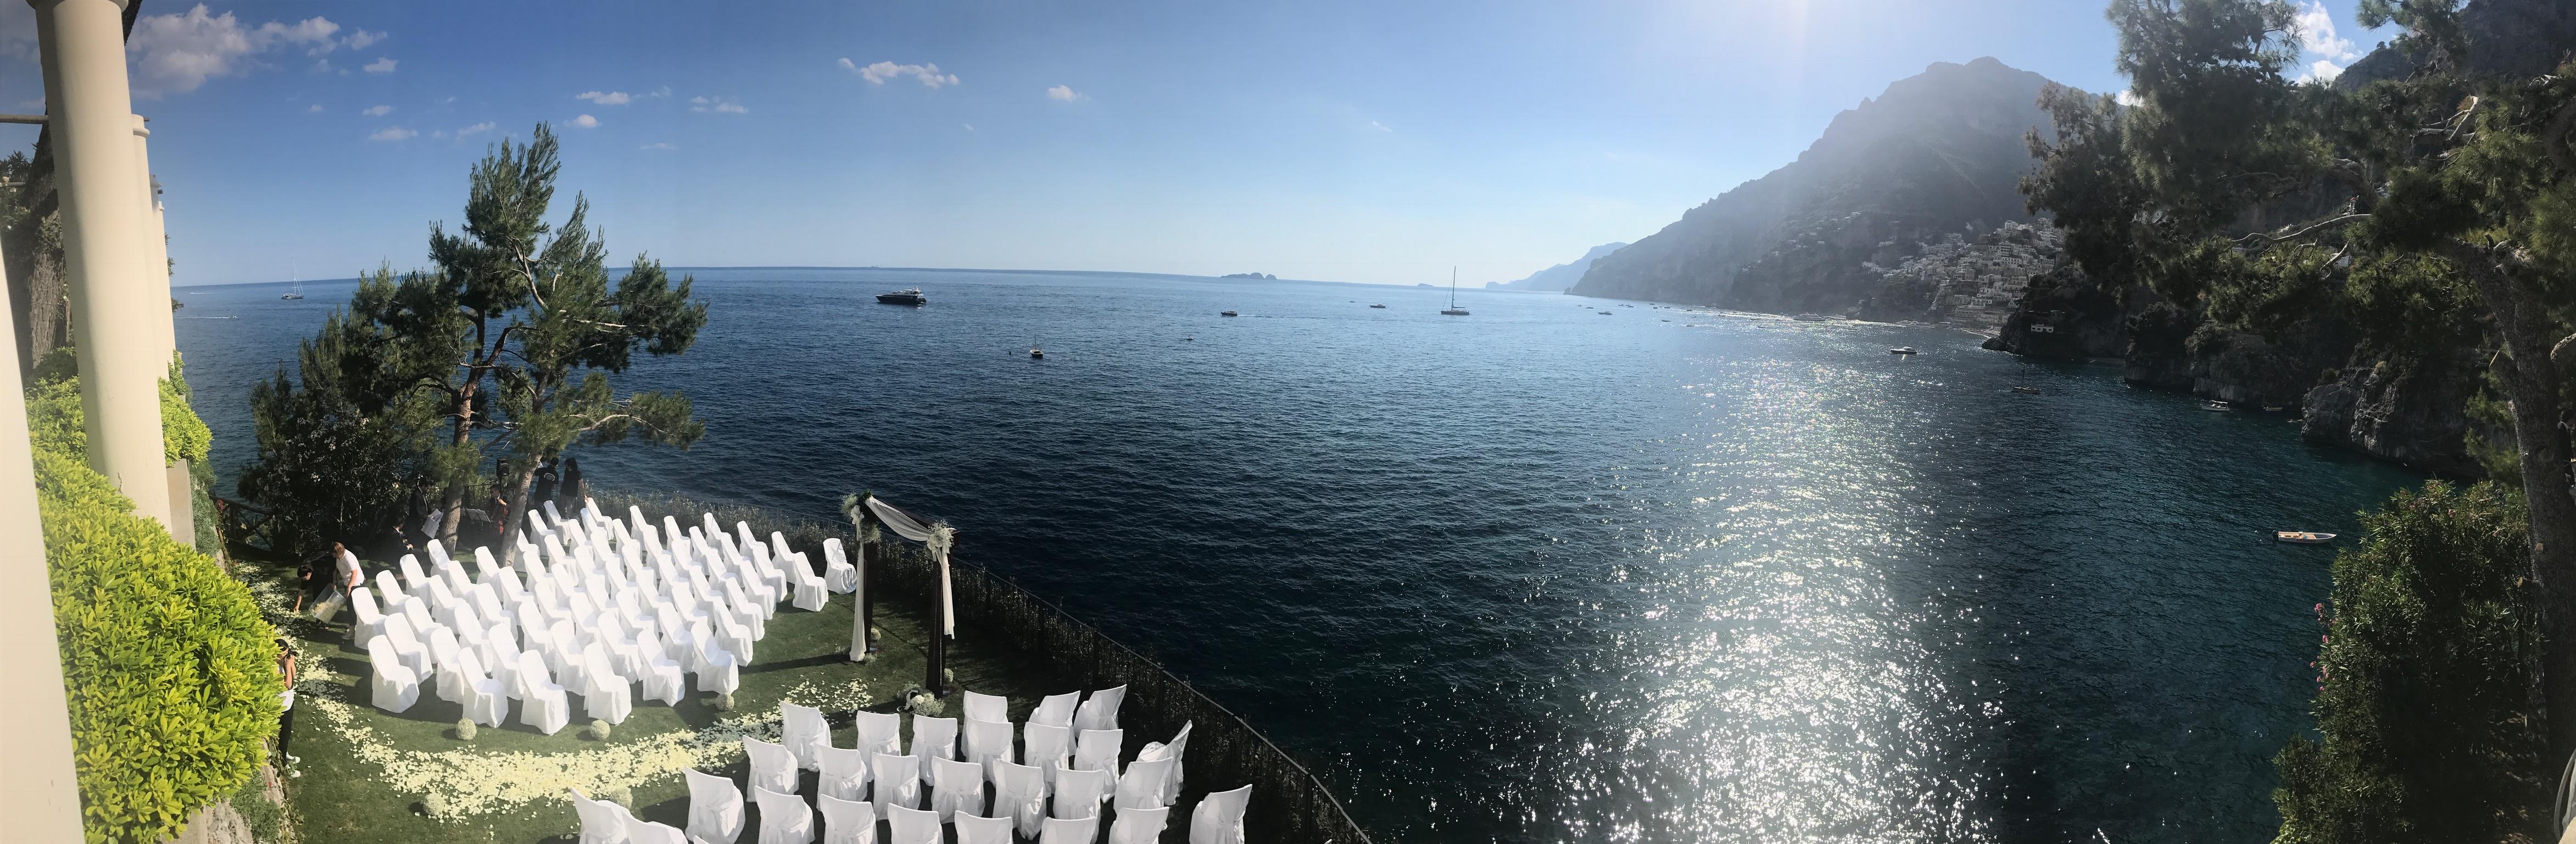 https://www.weddingamalfi.com/wp-content/uploads/Nathalie-and-Benjamin-wedding-in-Positano-1.png